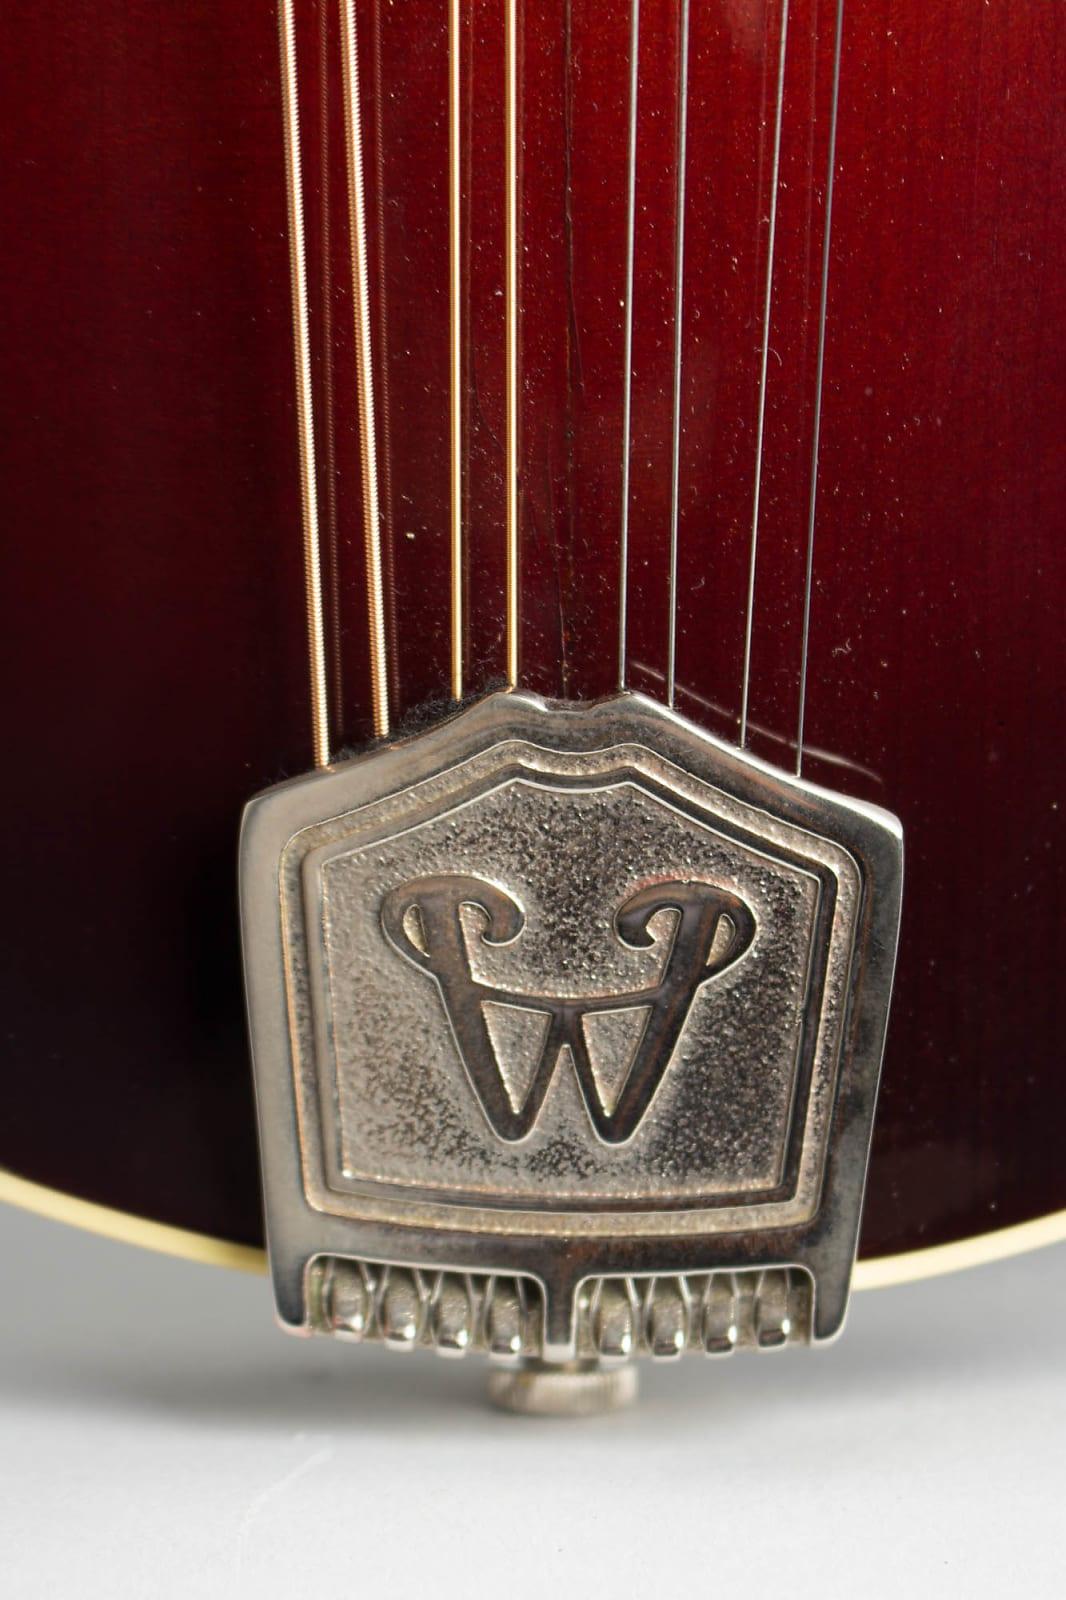 Weber  Yellowstone Carved Top Mandolin (2004), ser. #4199107, original grey hard shell case.